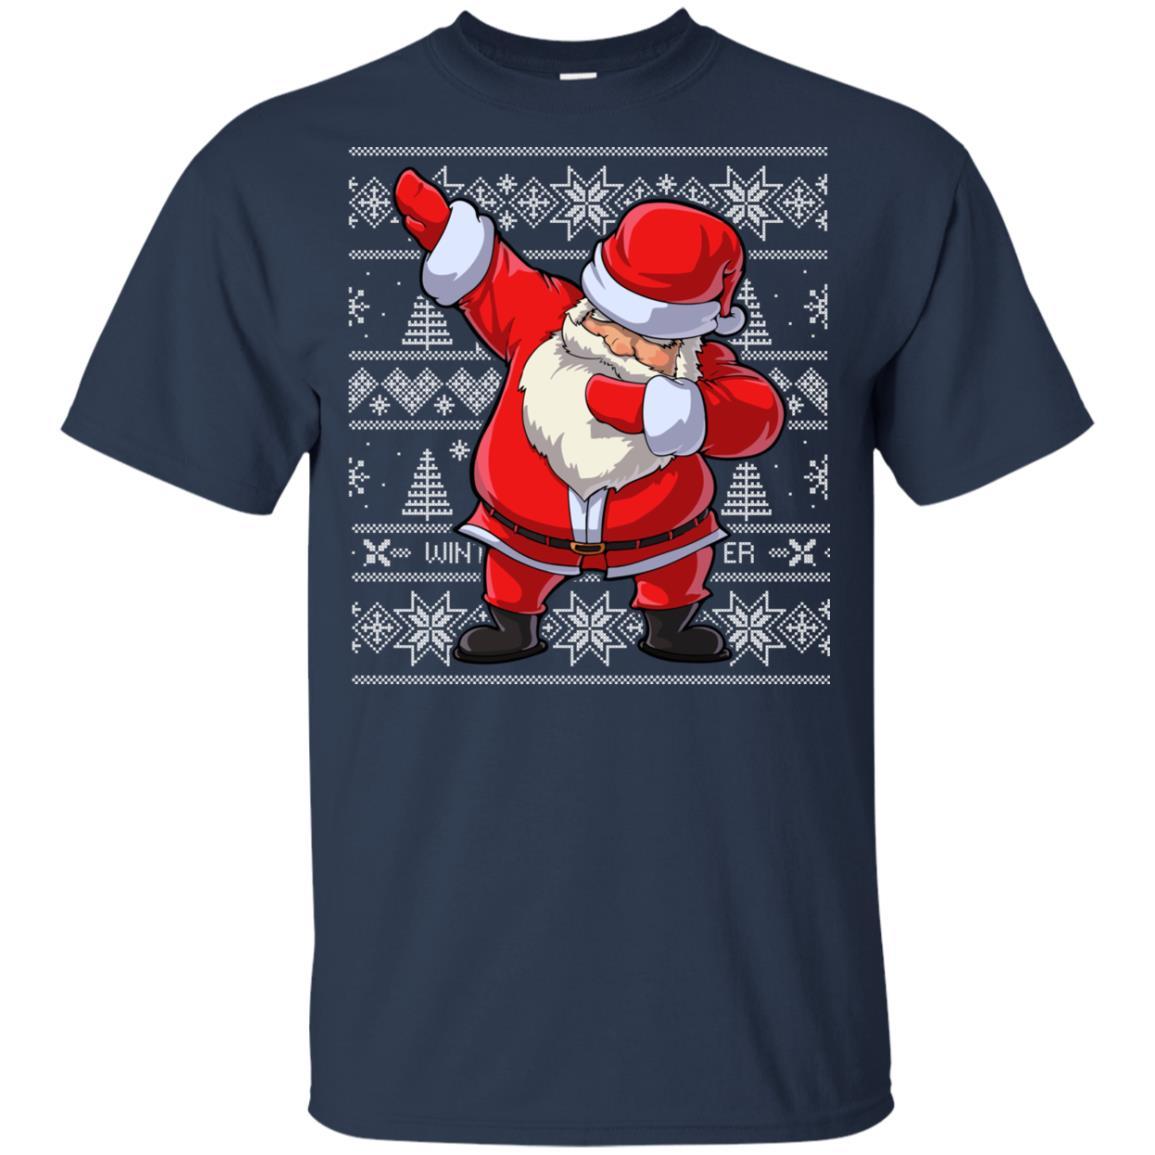 Christmass for Boys Dabbing Santa Kids Girls Xmas Gift-1 Youth Short Sleeve